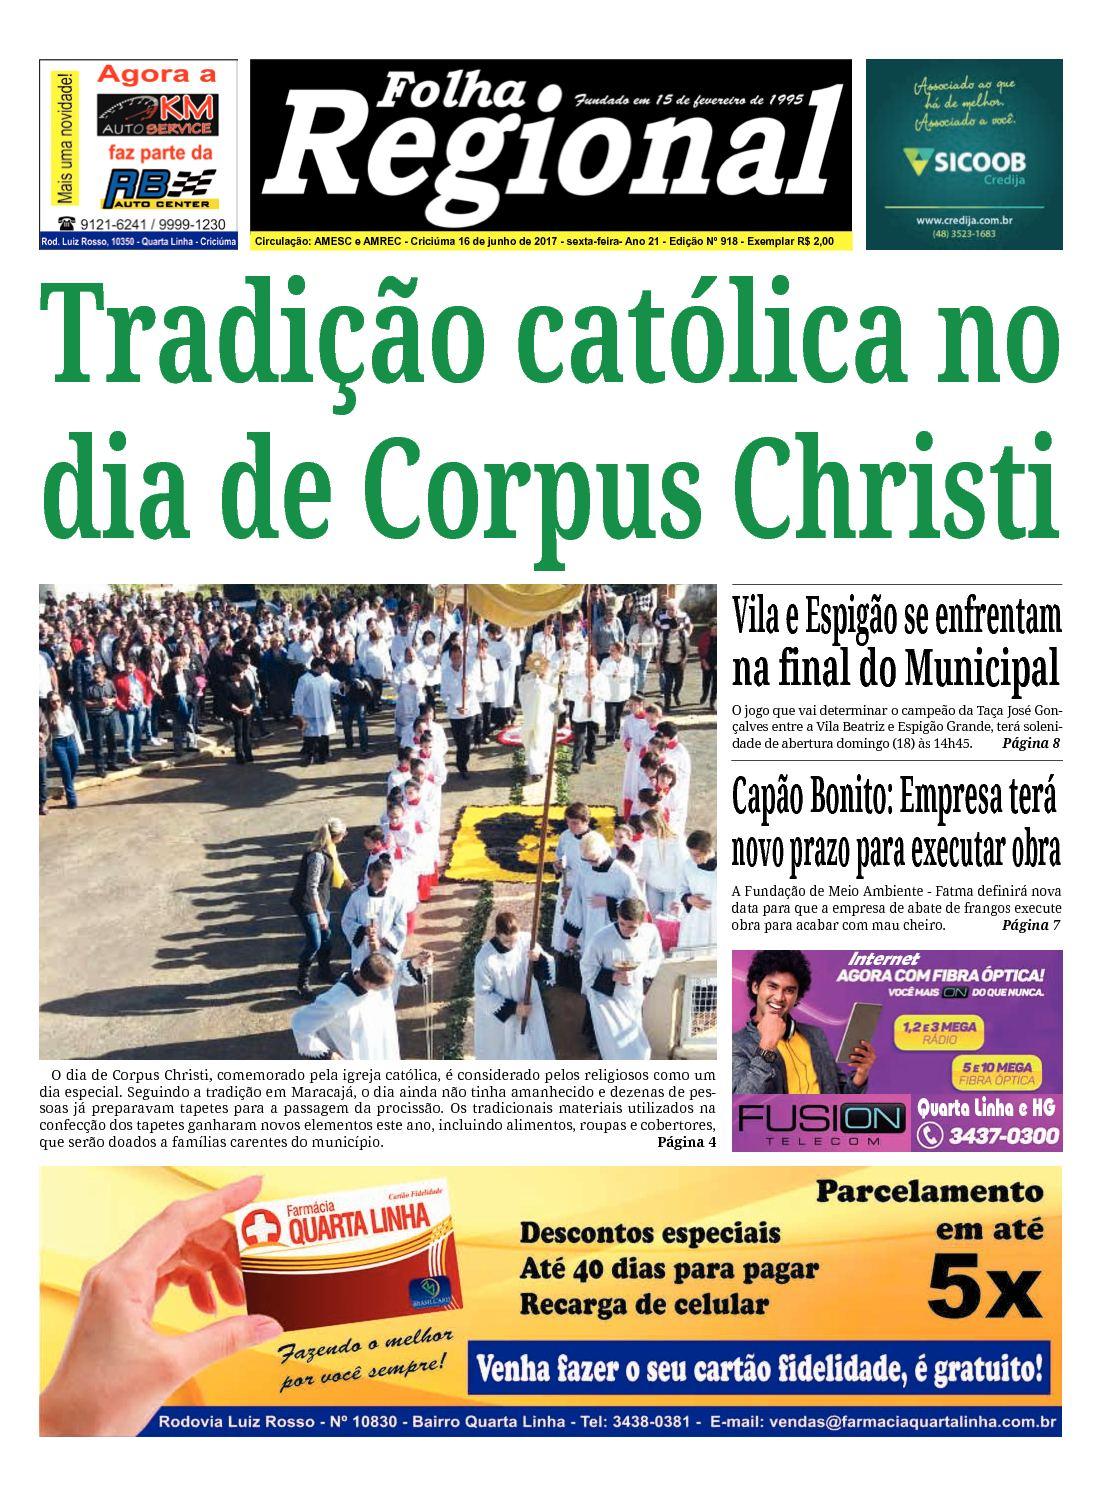 Calaméo - Folha Regional Ed.918 - 16 06 2017 3f7cb0facc